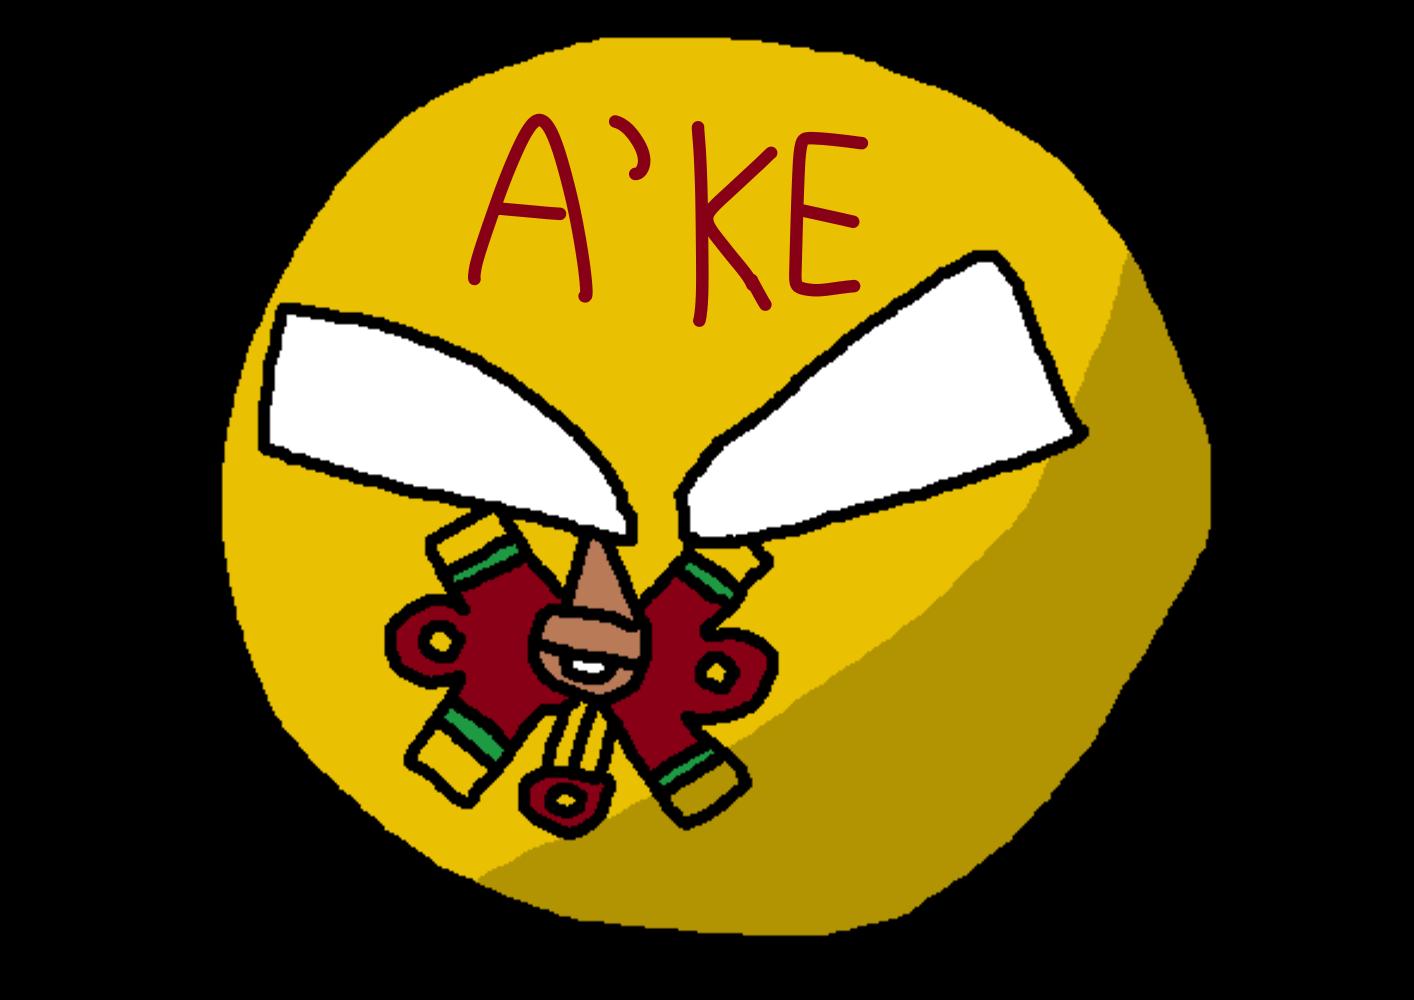 A'keball